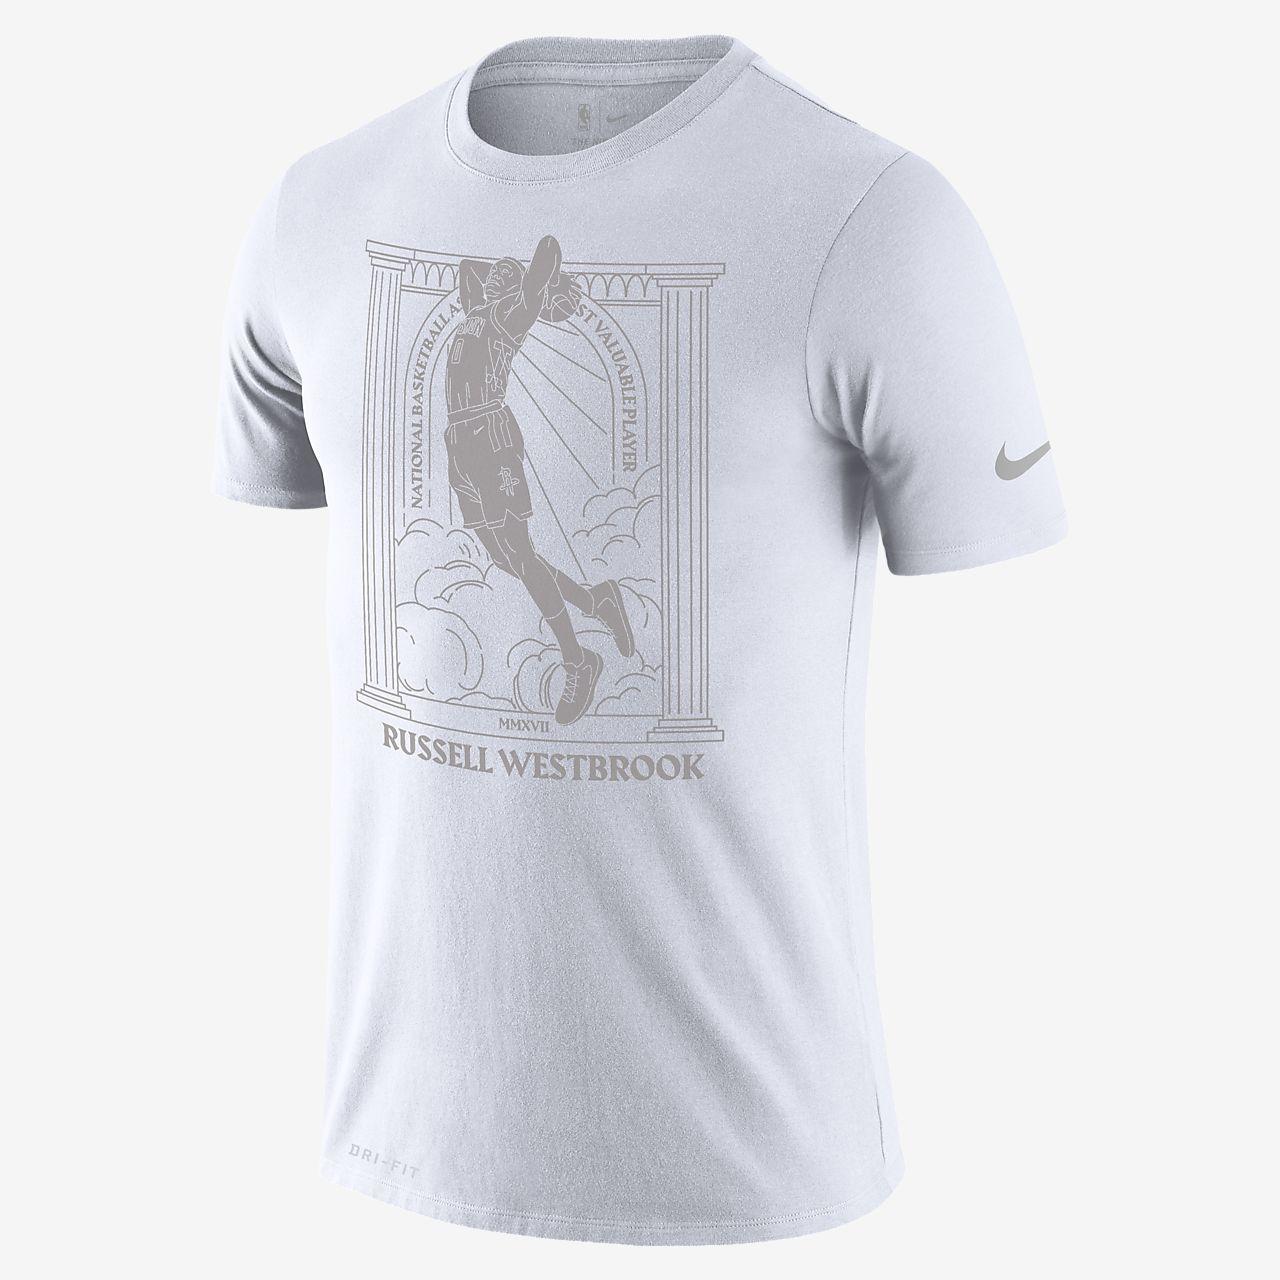 Russell Westbrook Rockets MVP Men's Nike Dri-FIT NBA T-Shirt